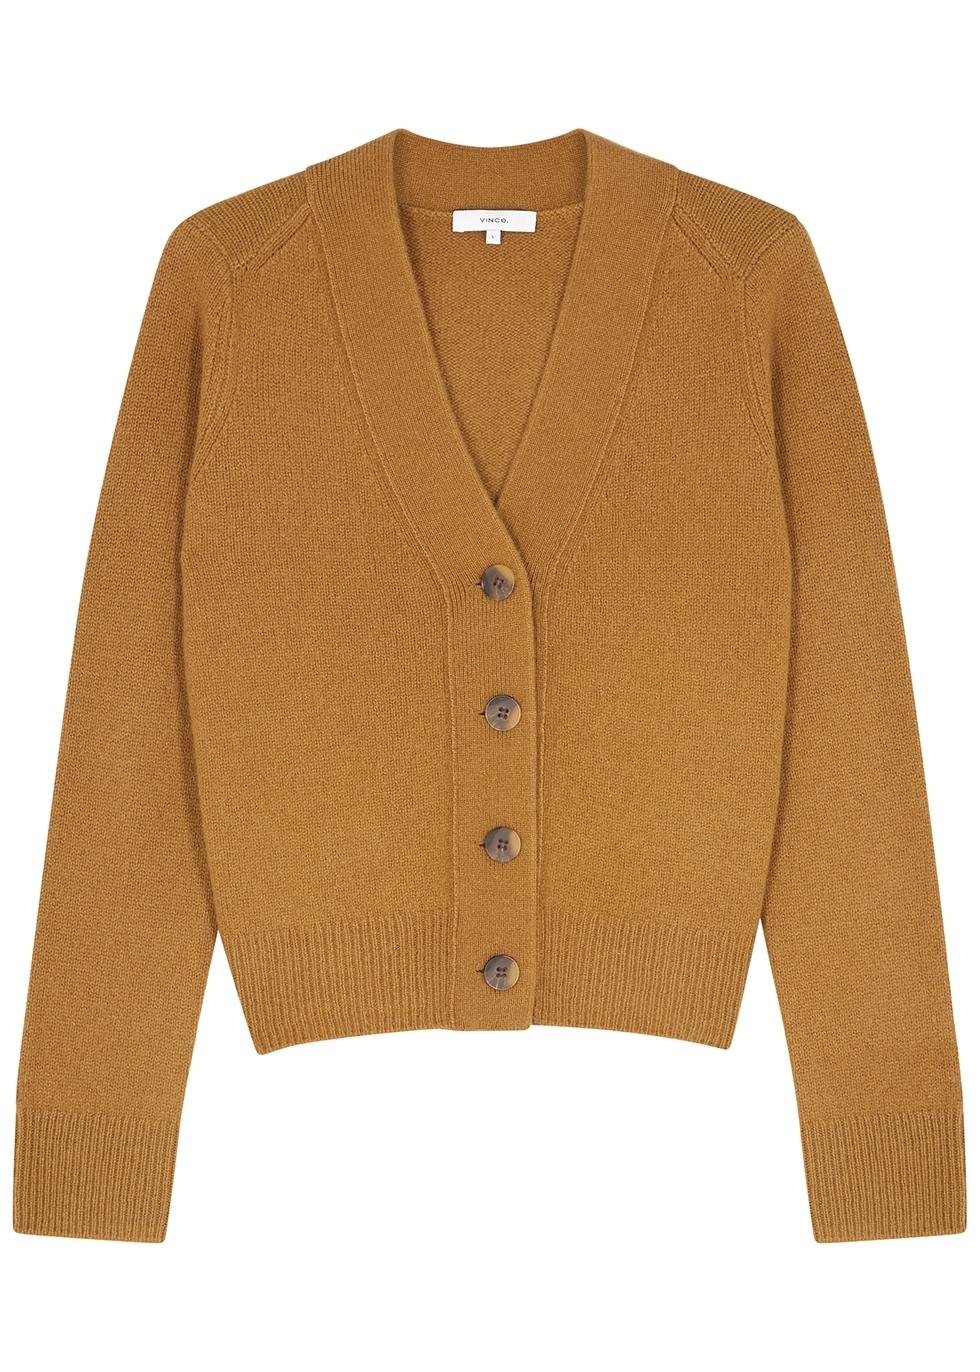 26184ec85bf59b Women's Designer Knitwear and Jumpers - Harvey Nichols